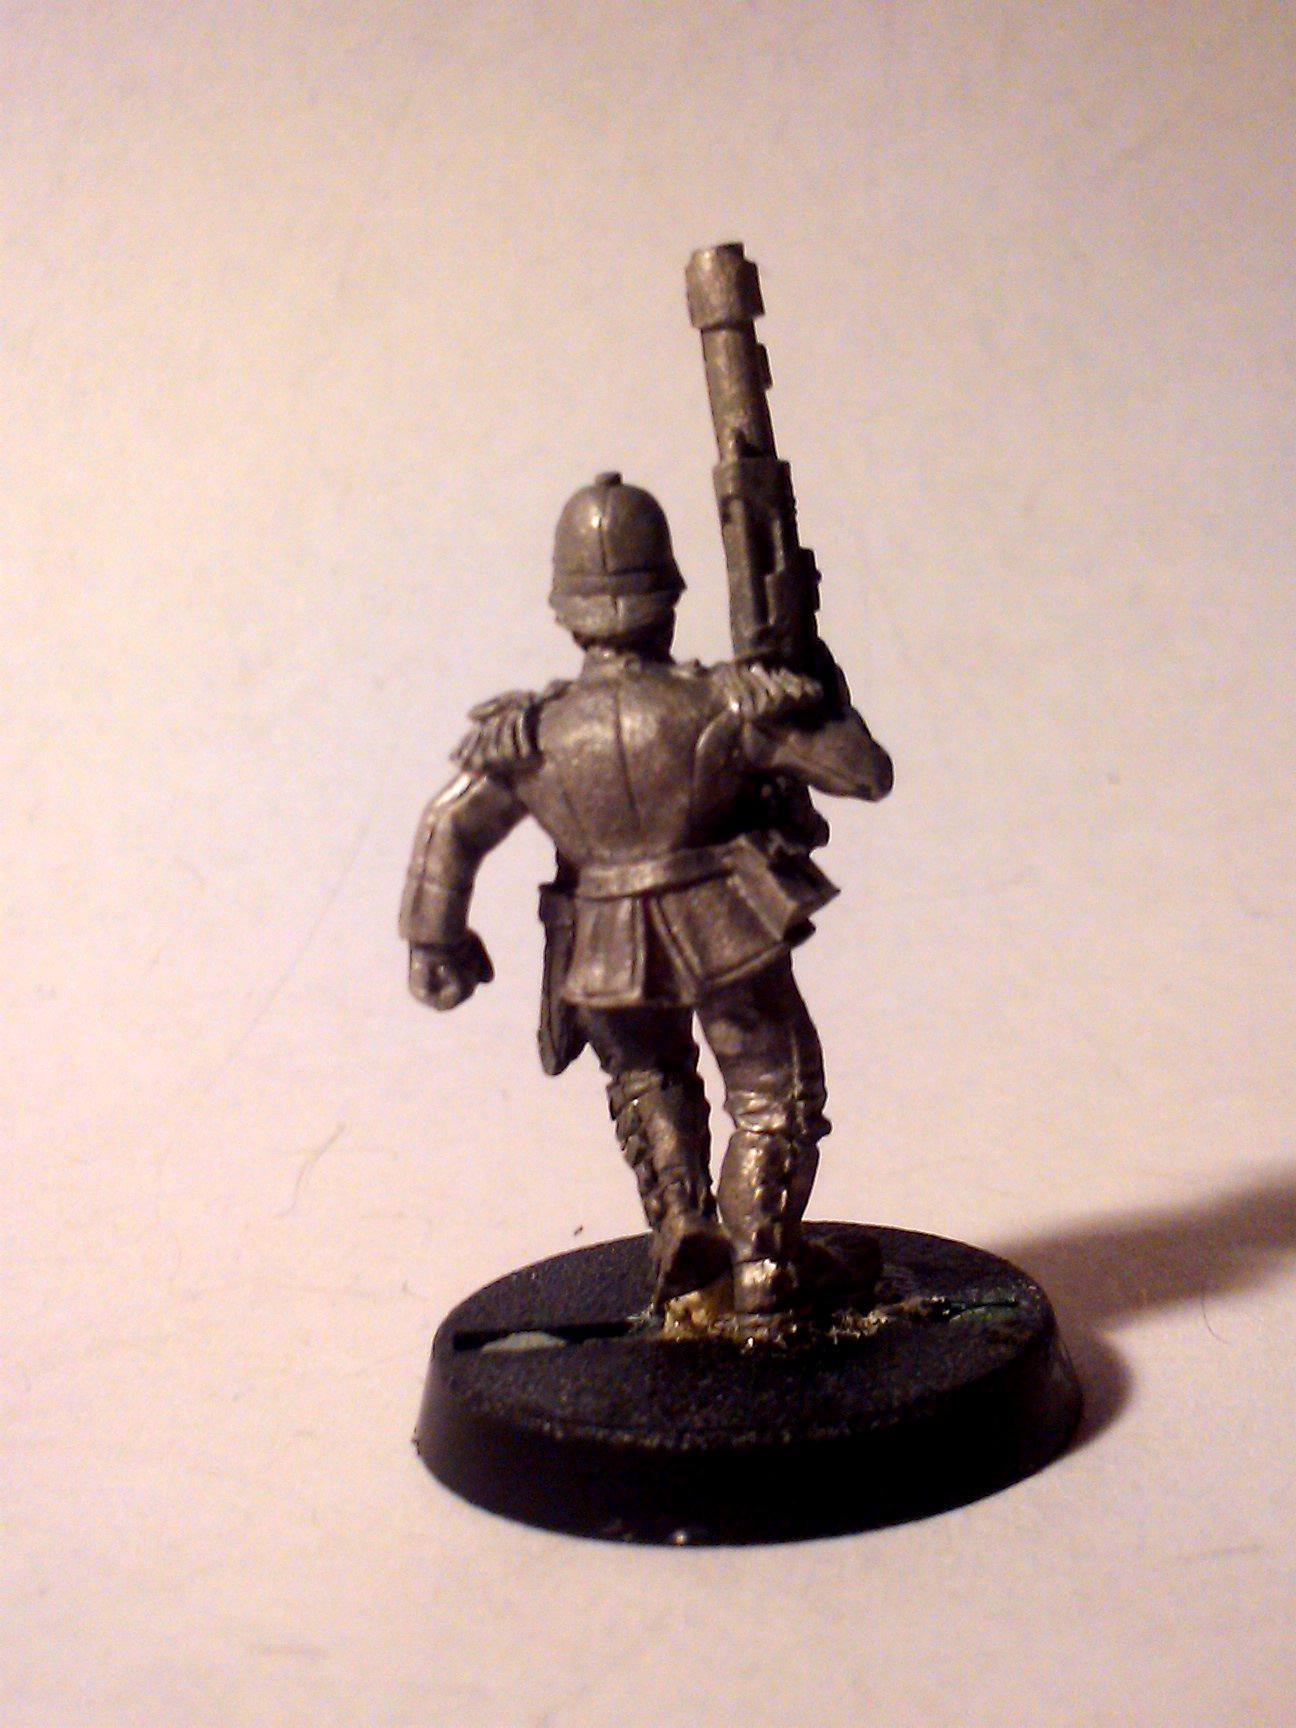 Build, Conversion, Games Workshop, Imperial Guard, Painting, Praetorians, Project, Warhammer 40,000, Warhammer Fantasy